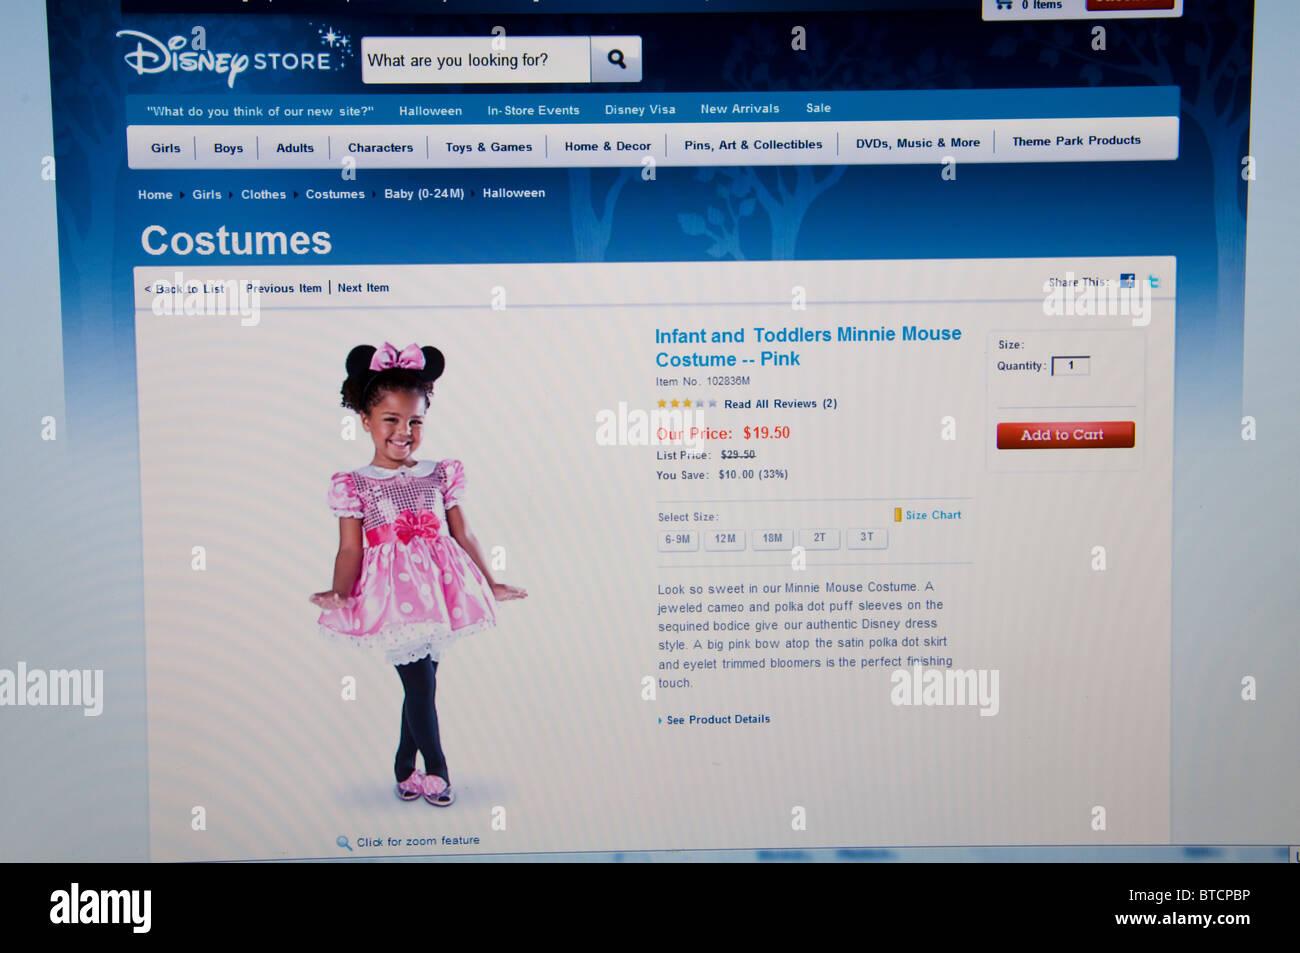 disney store halloween website online stock photo: 32243114 - alamy